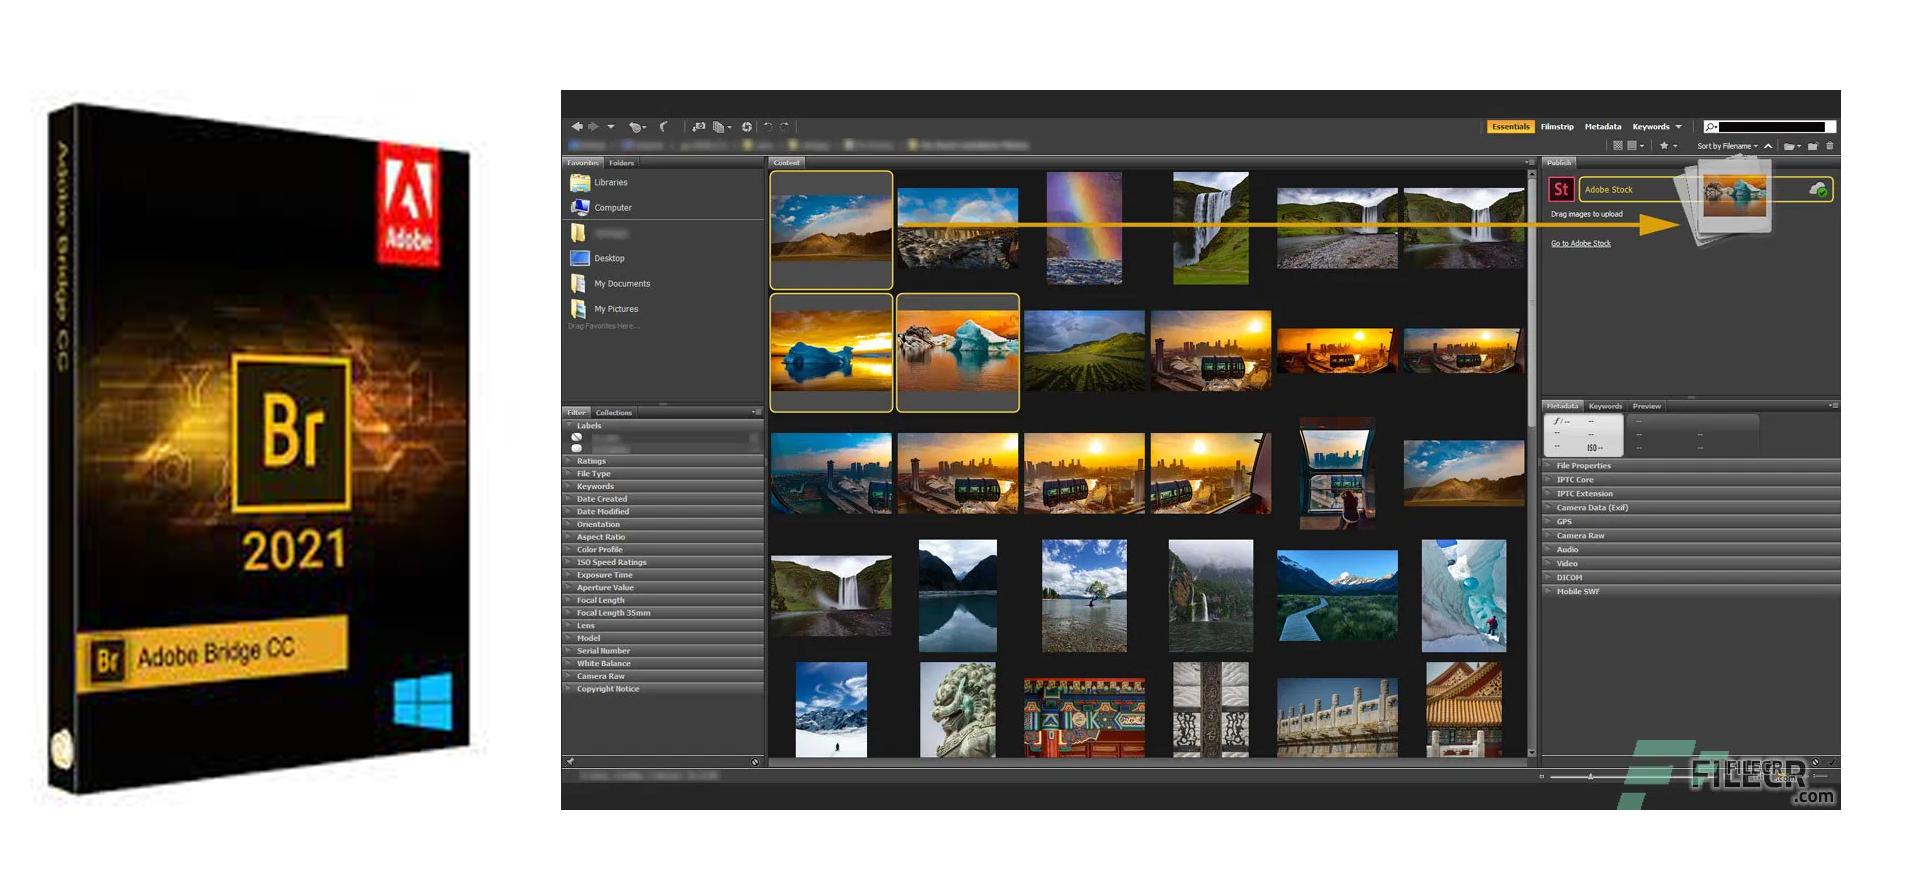 Cara Install Adobe Bridge CC 2021 Full Version